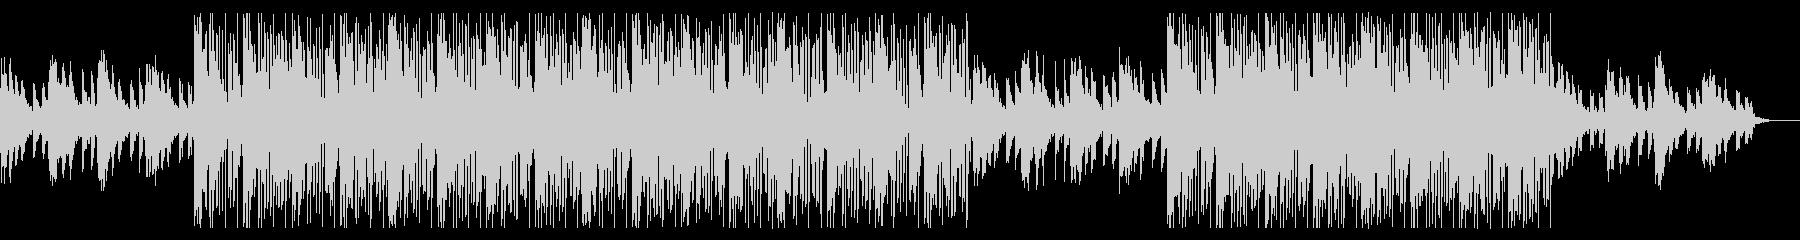 K-POP/感動的/浮遊感/ダンスポップの未再生の波形